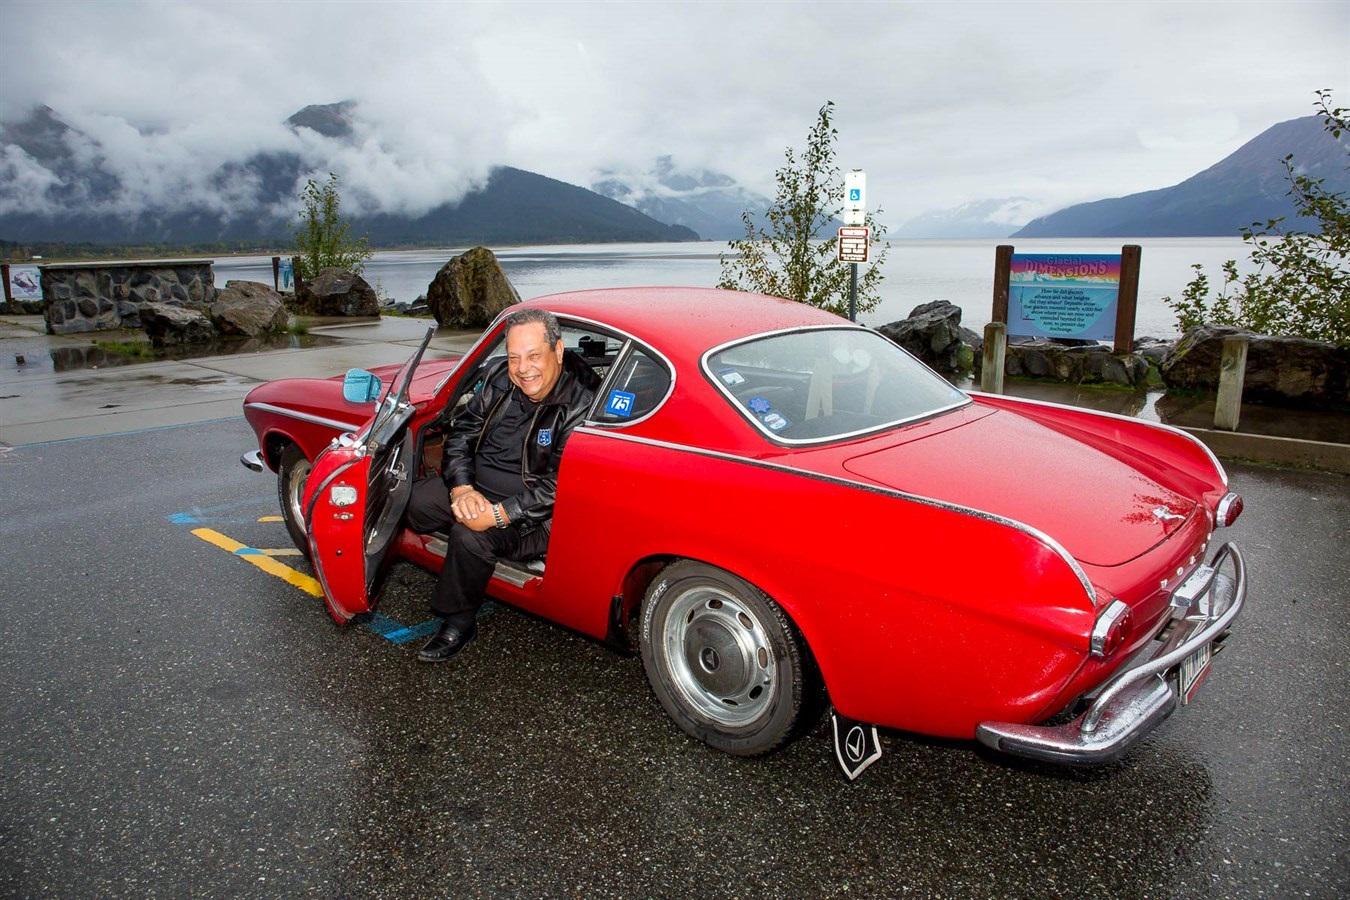 Umro je Irv Gordon – vlasnik legendarnog Volvoa P1800S (VIDEO)